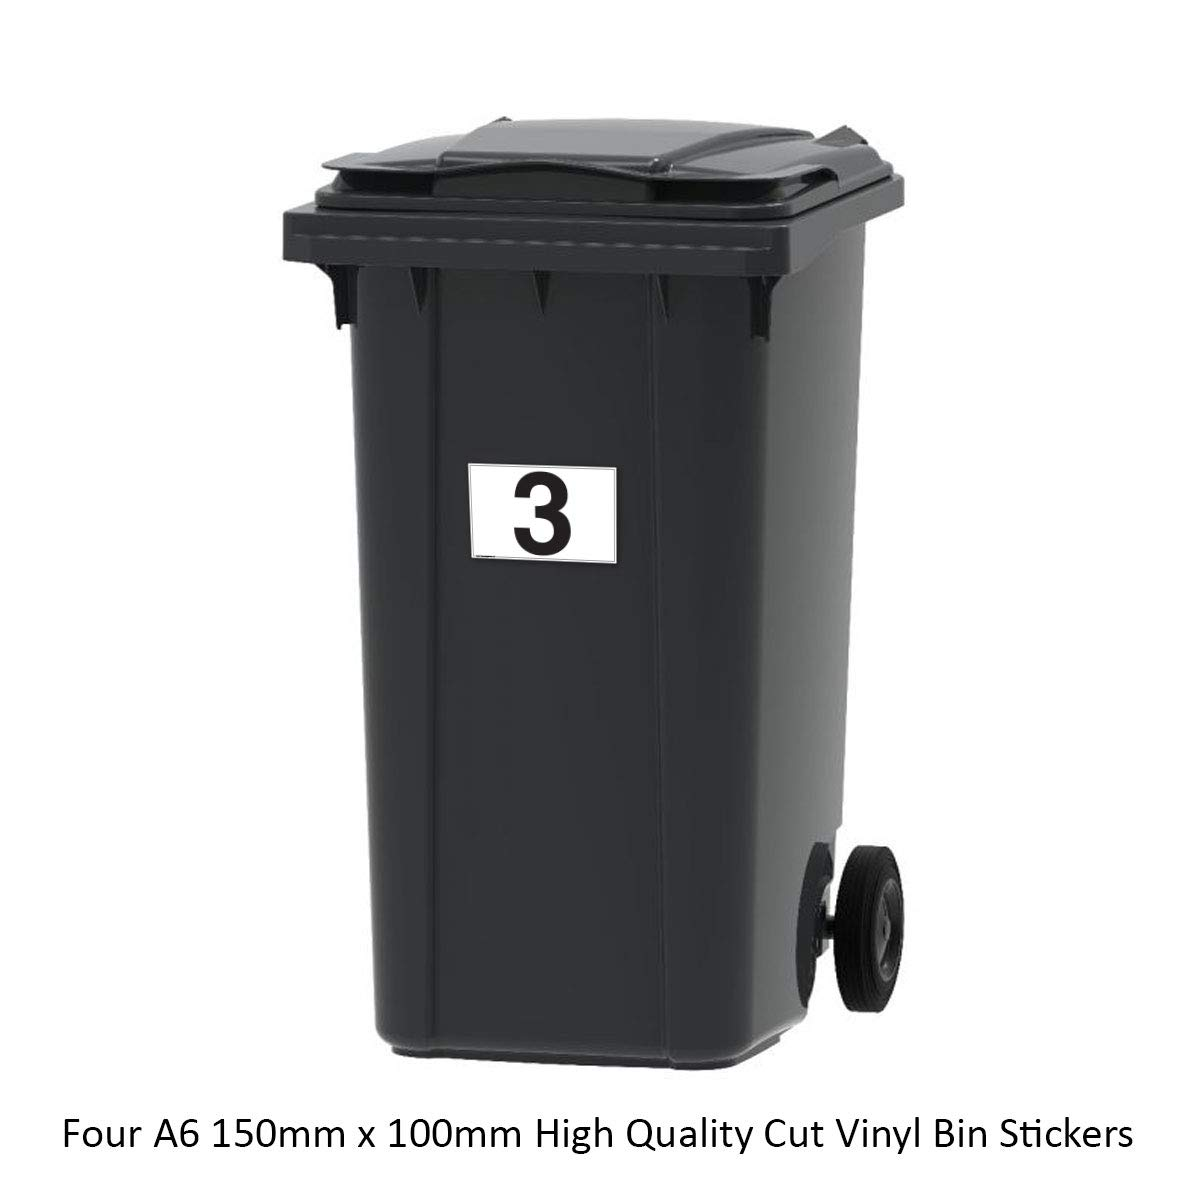 4 x A6 Stickers Pixel Widgets Number Only Wheelie Bin Stickers//Address Plaques